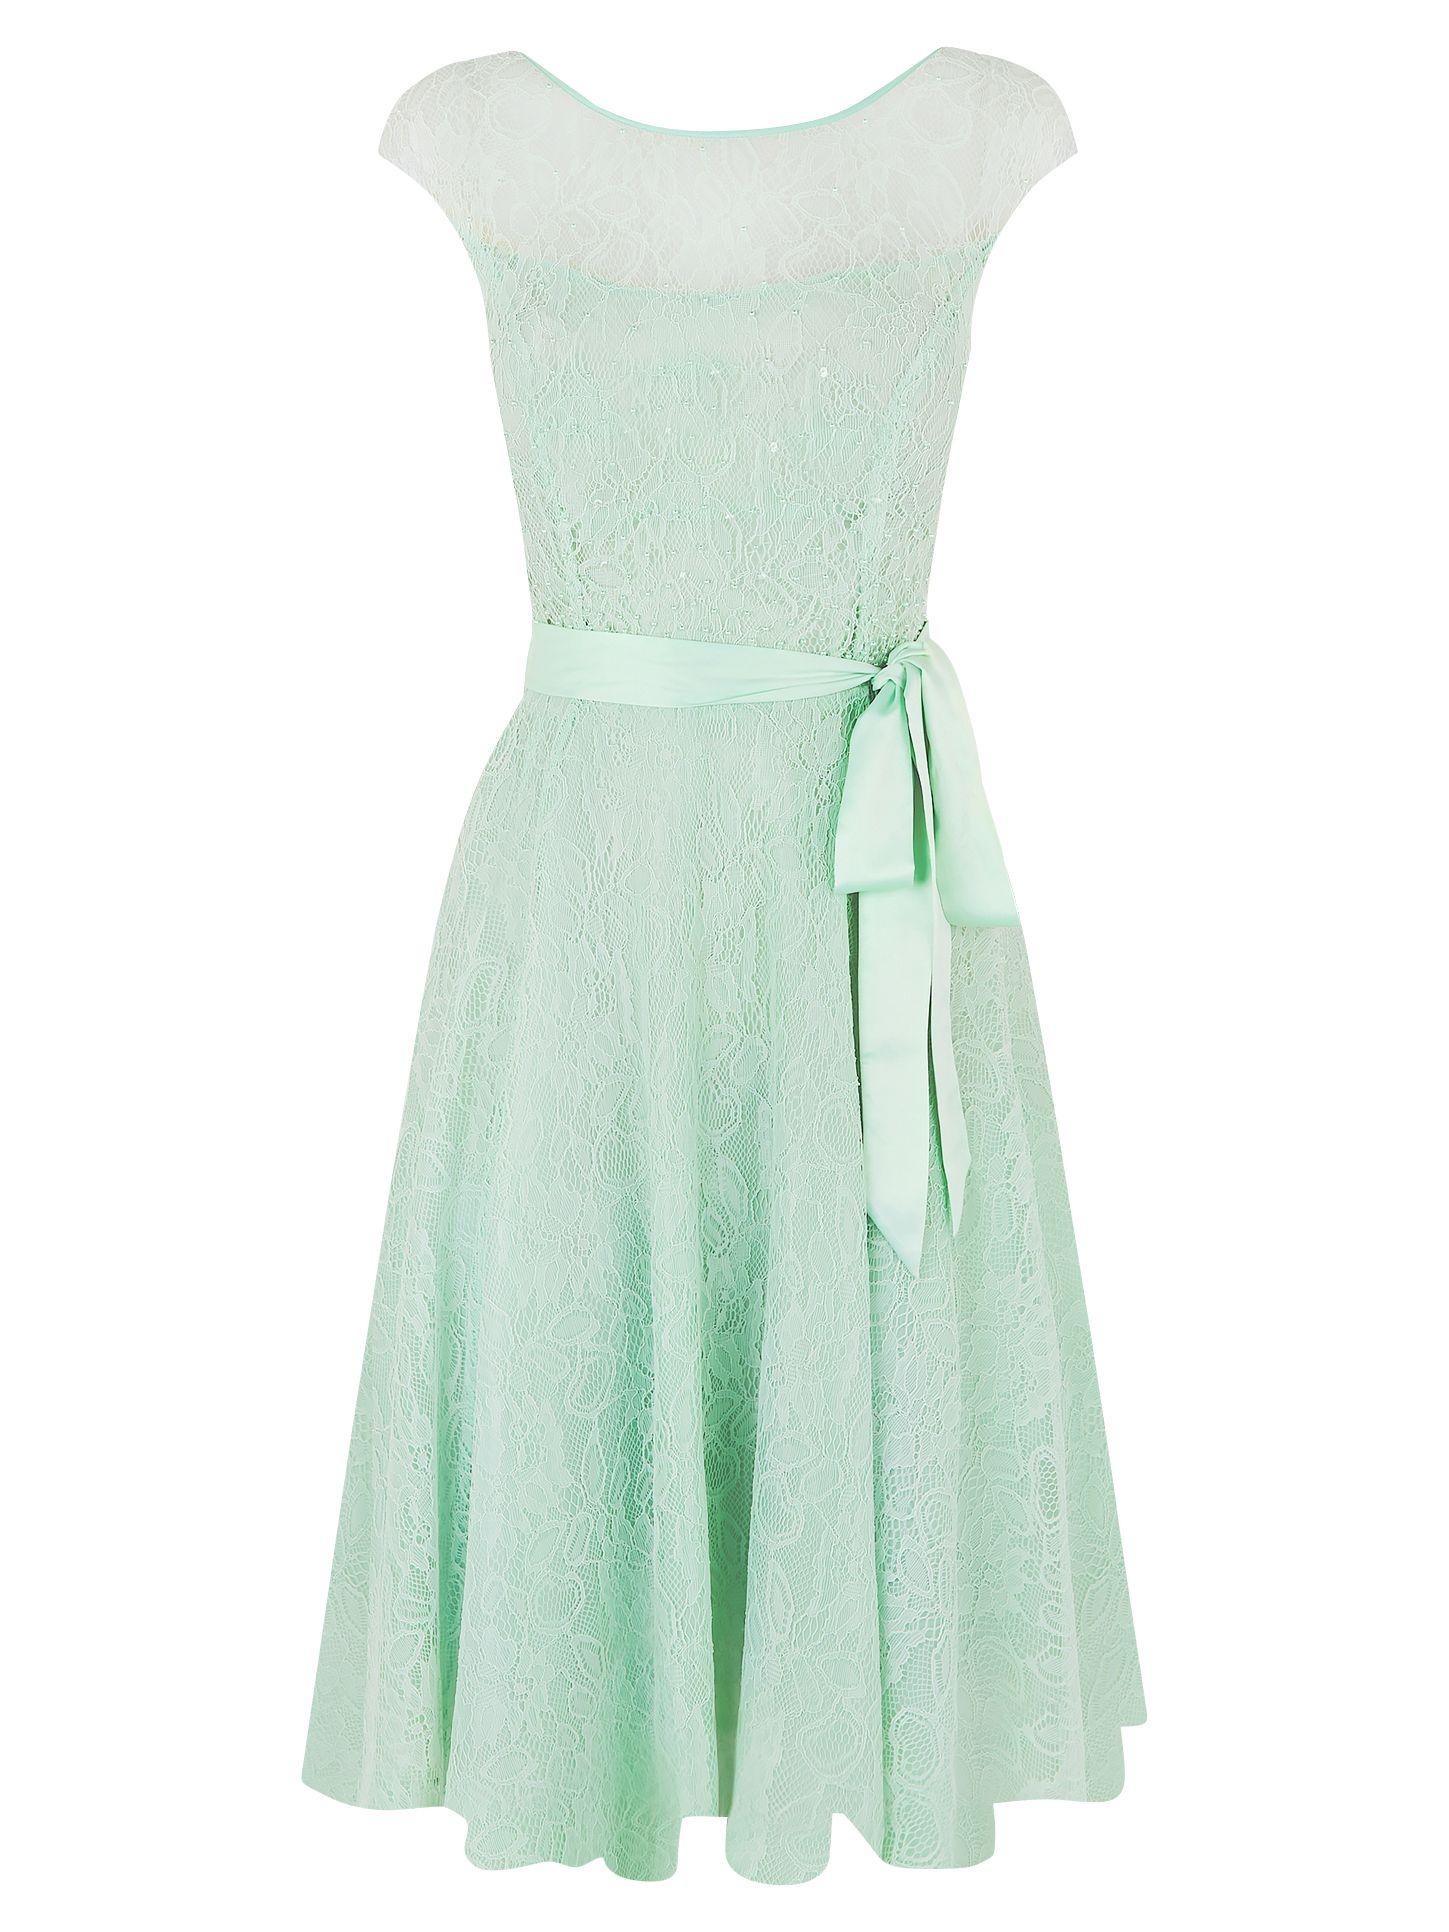 kaliko beaded lace prom dress, kaliko, beaded, lace, prom, dress, pastel yellow|pastel green|pastel yellow|pastel yellow|pastel green|pastel green|pastel yellow|pastel green|pastel yellow|pastel green|pastel yellow|pastel yellow|pastel green|pastel green, 8|8|14|20|12|16|10|18|16|20|12|18|10|14, women, plus size, womens dresses, 1939248